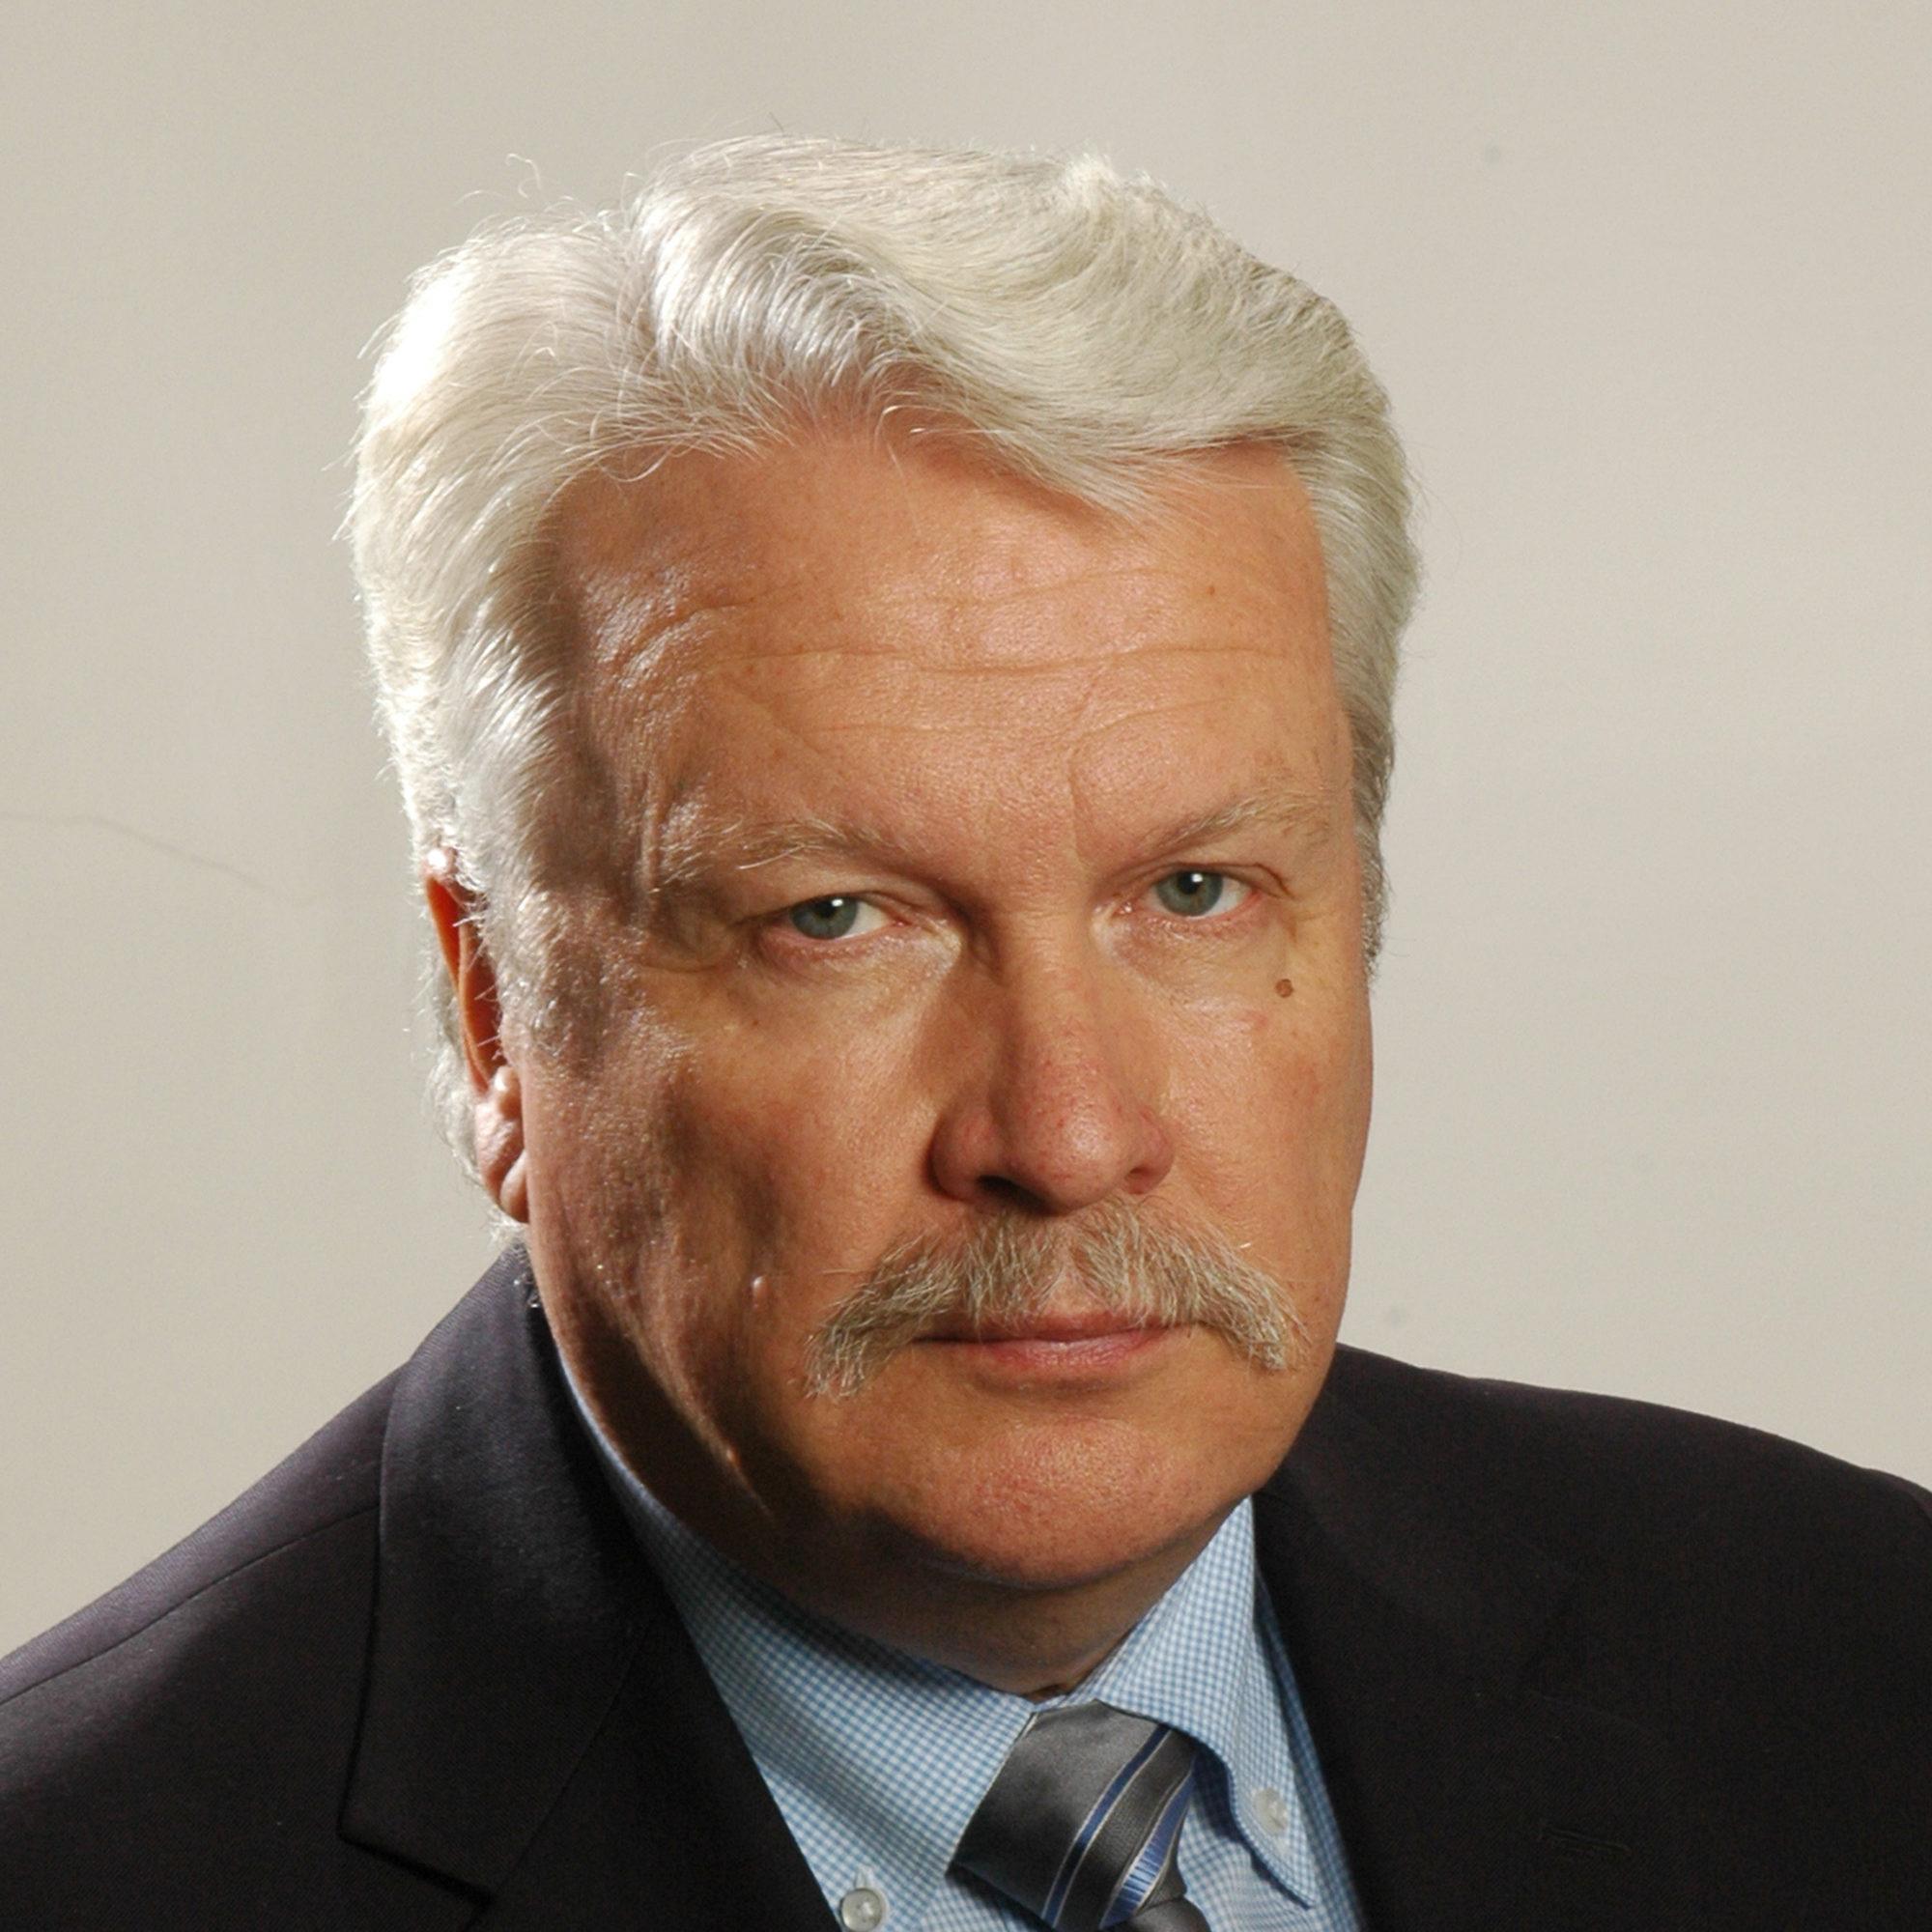 Mr. Jānis Duklavs